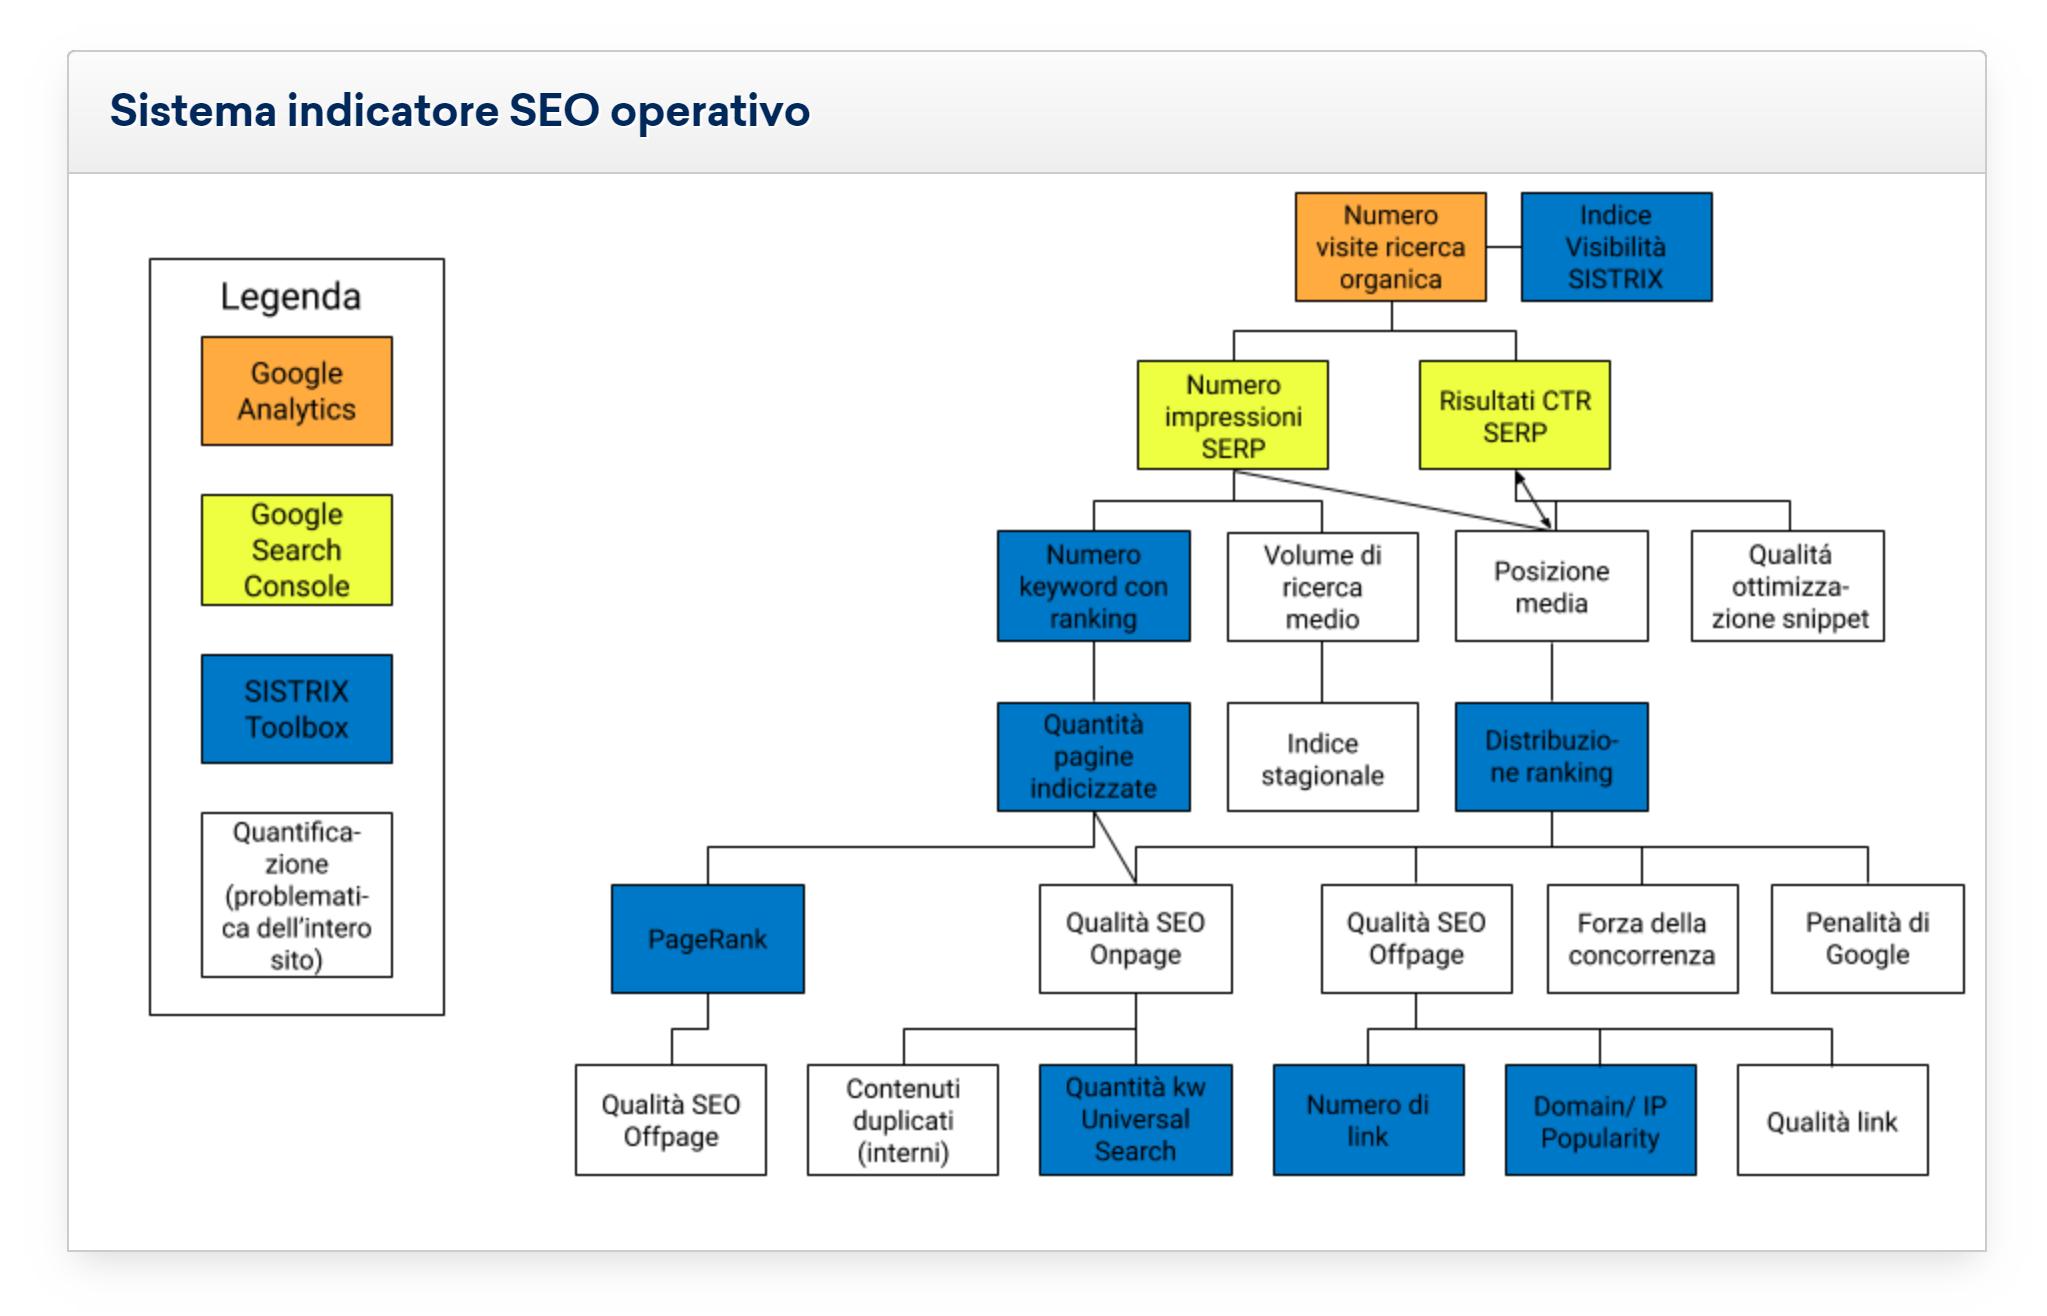 Infografica per sistema indicatore seo operativo